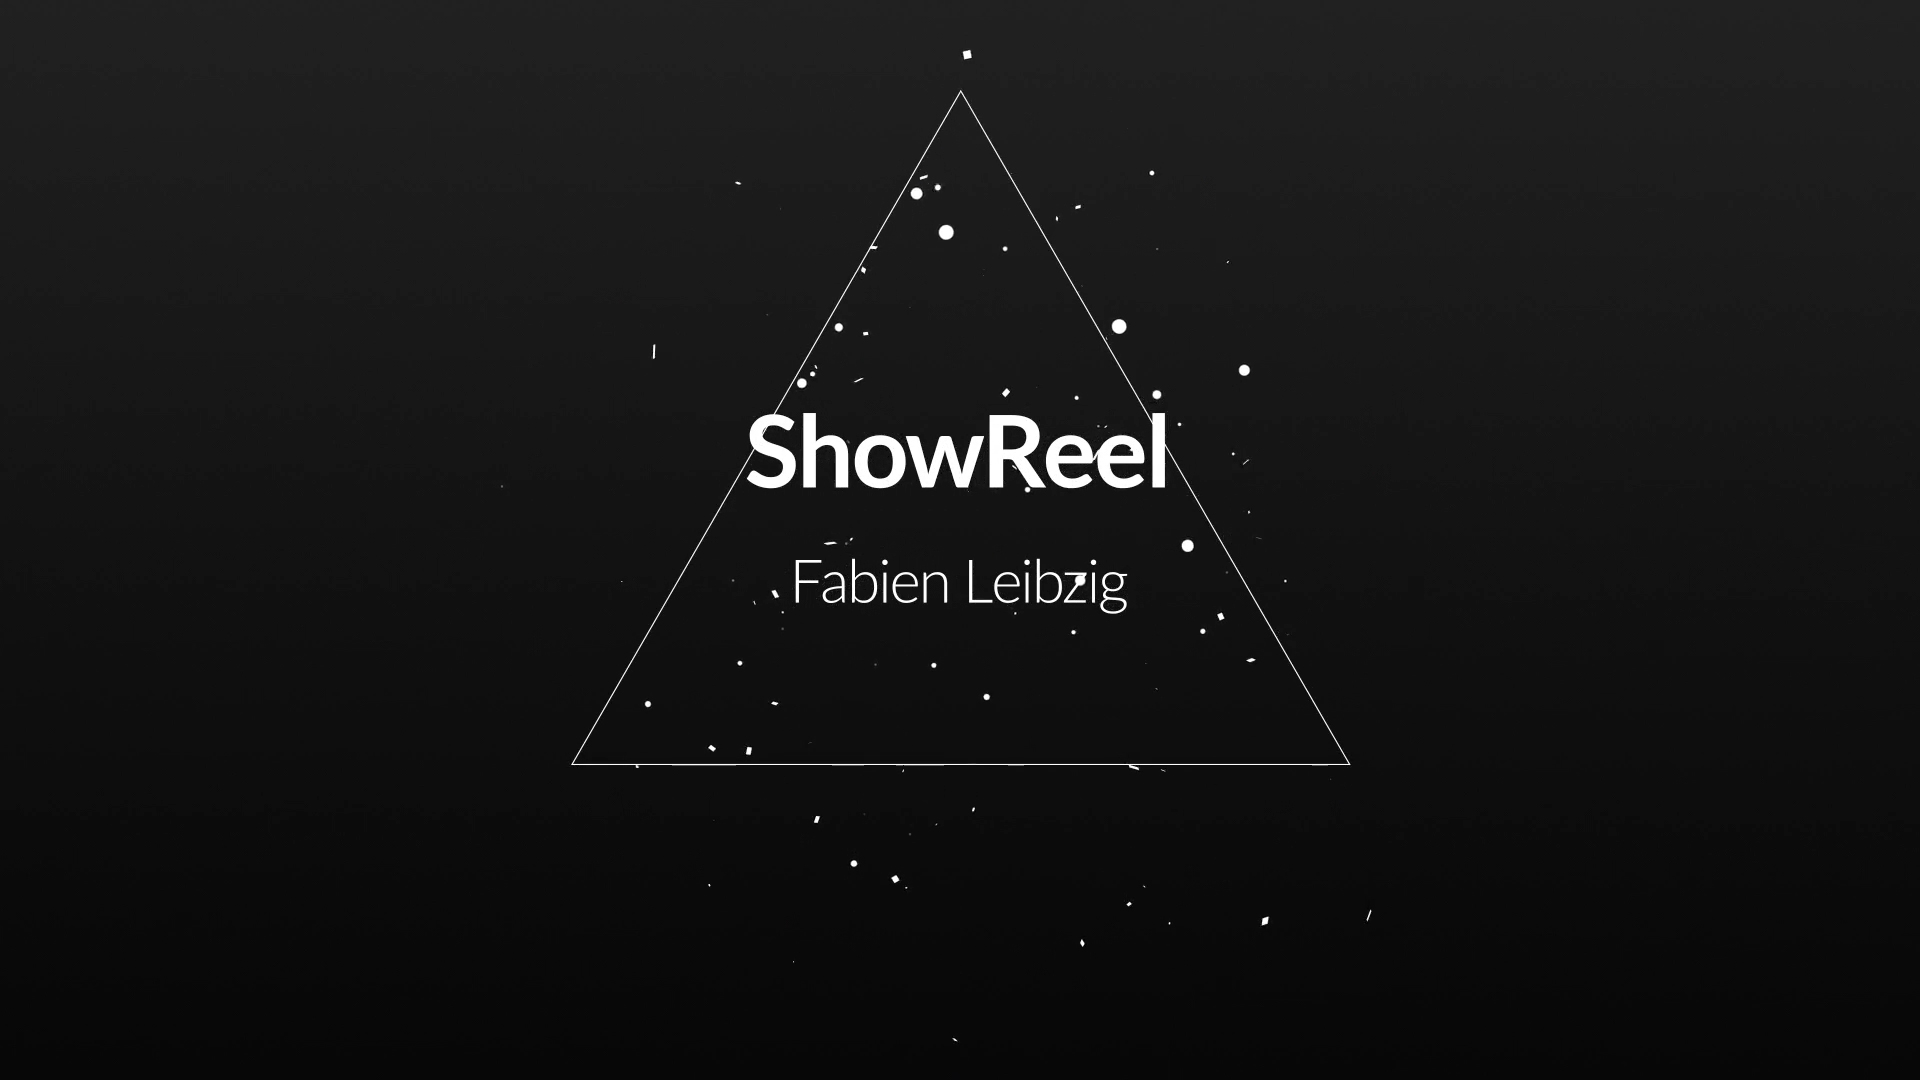 Showreel-img-3-title-web.jpg